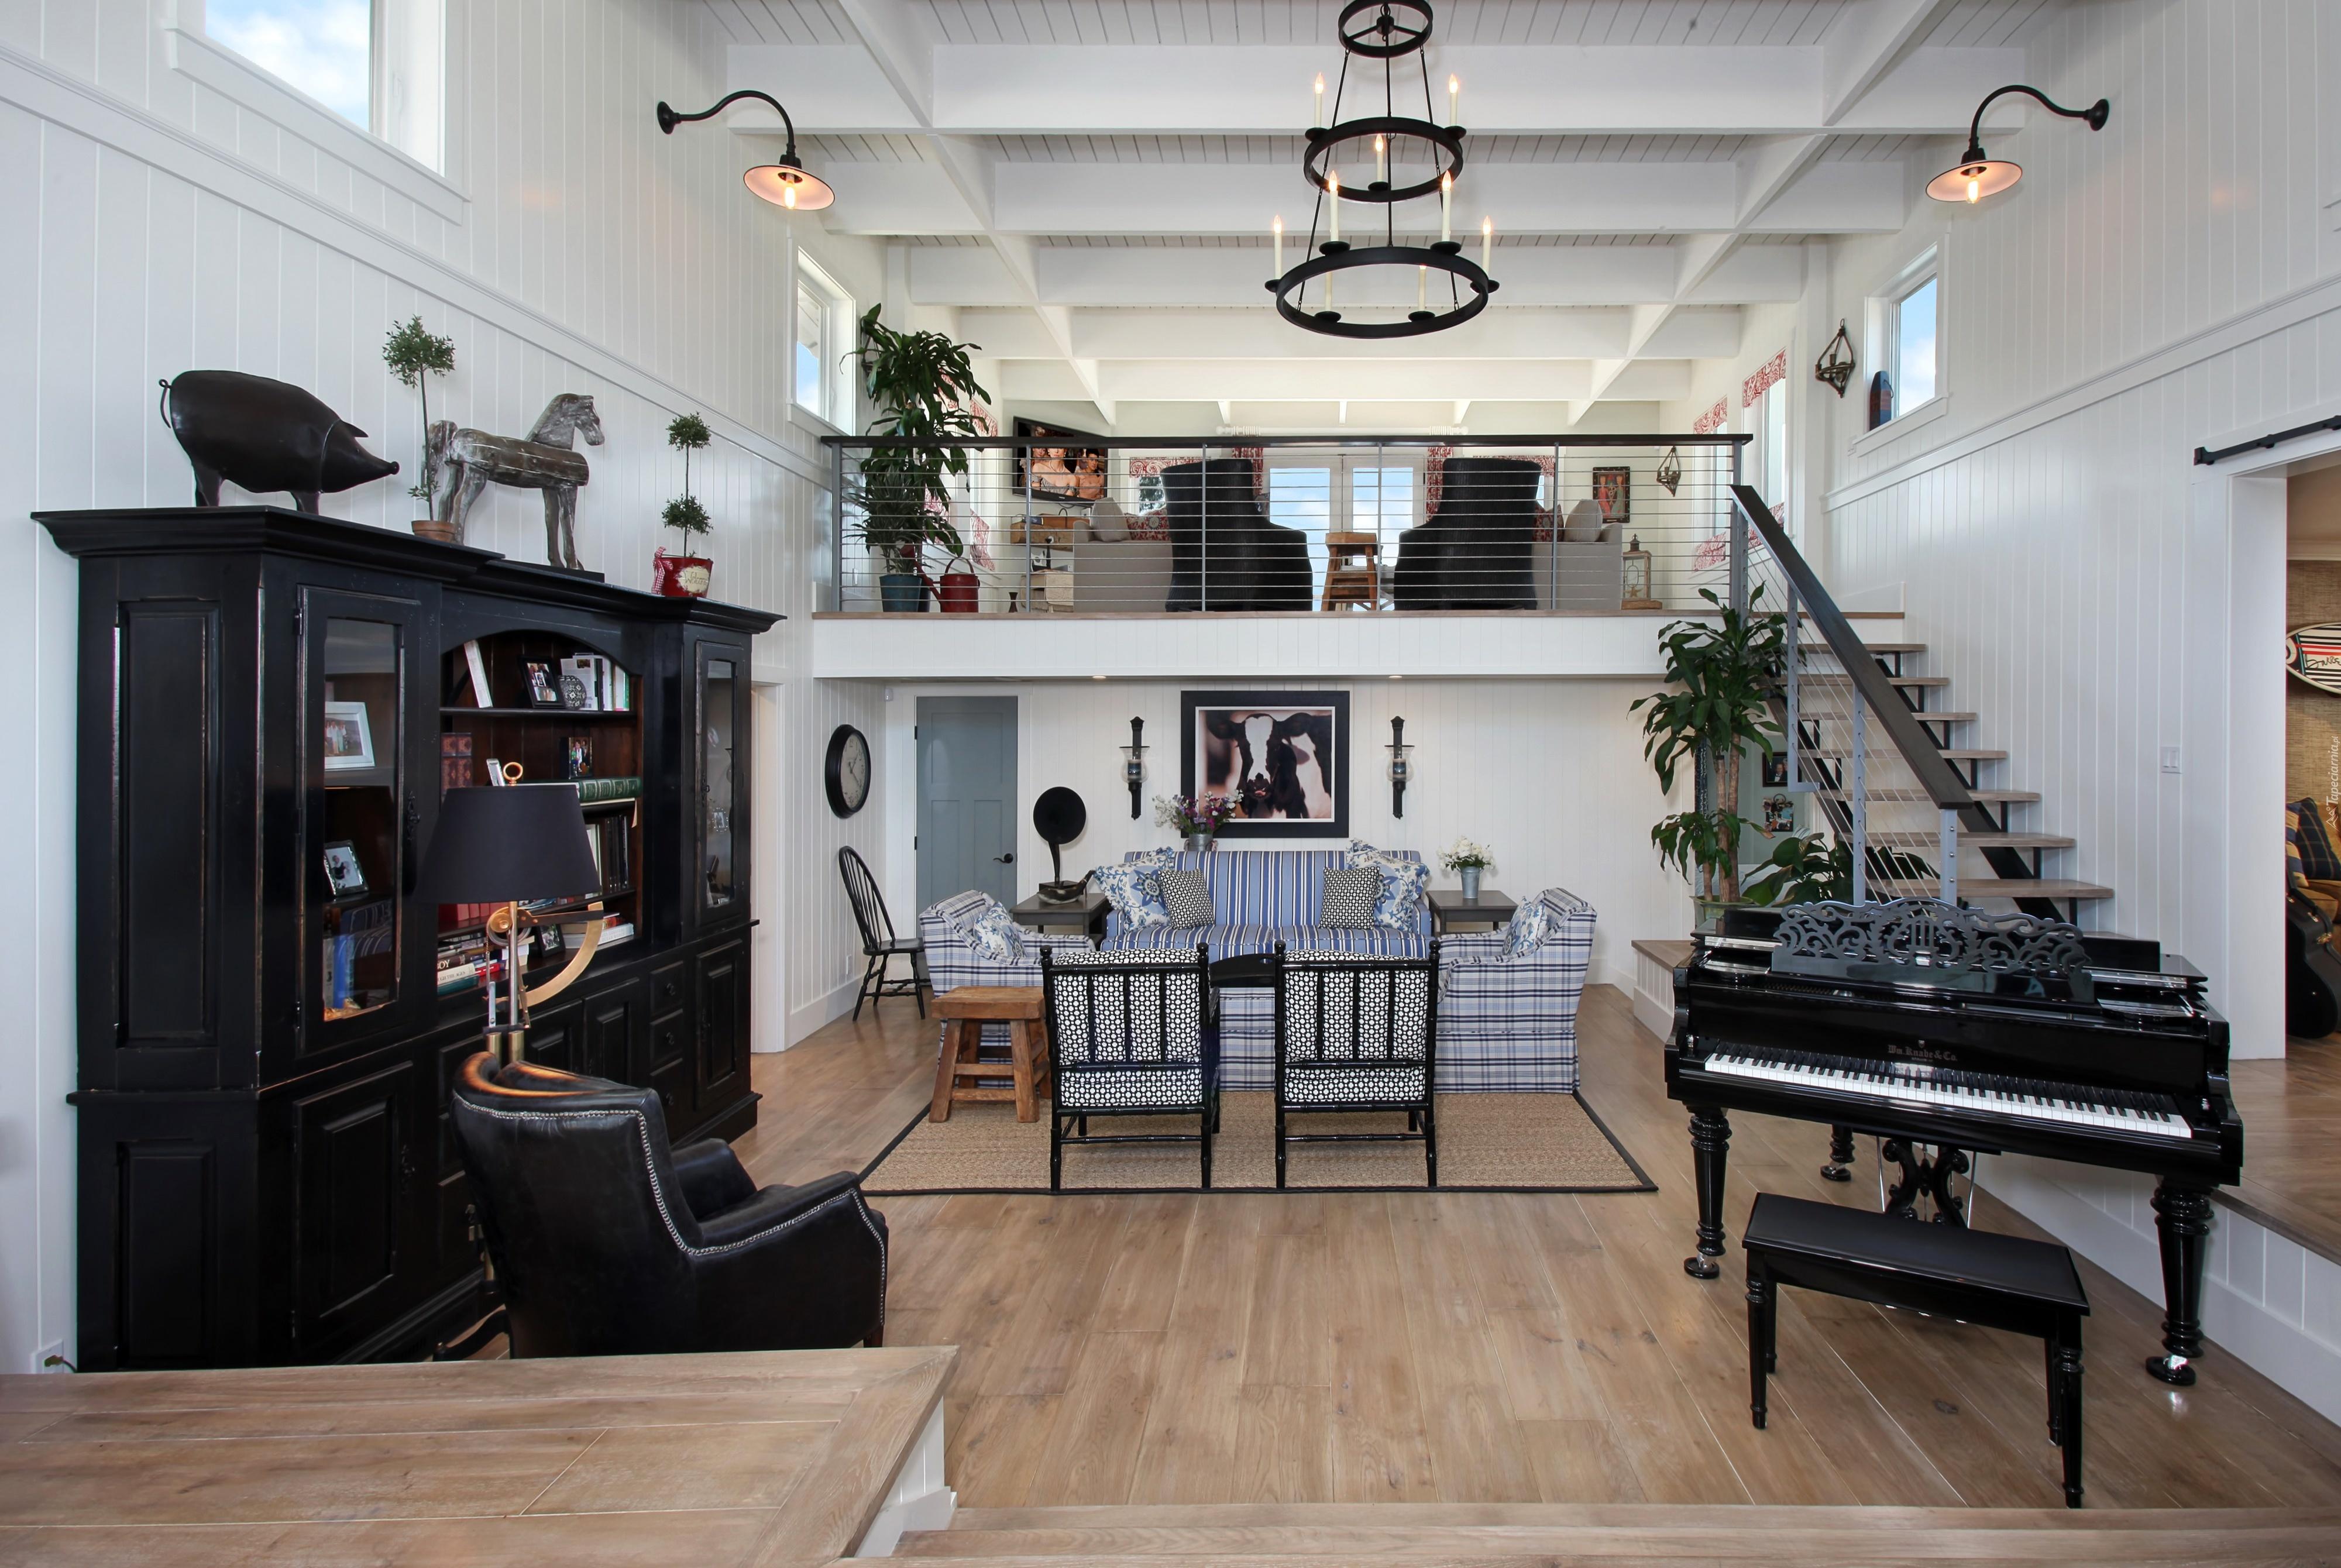 salon fortepian meble schody. Black Bedroom Furniture Sets. Home Design Ideas